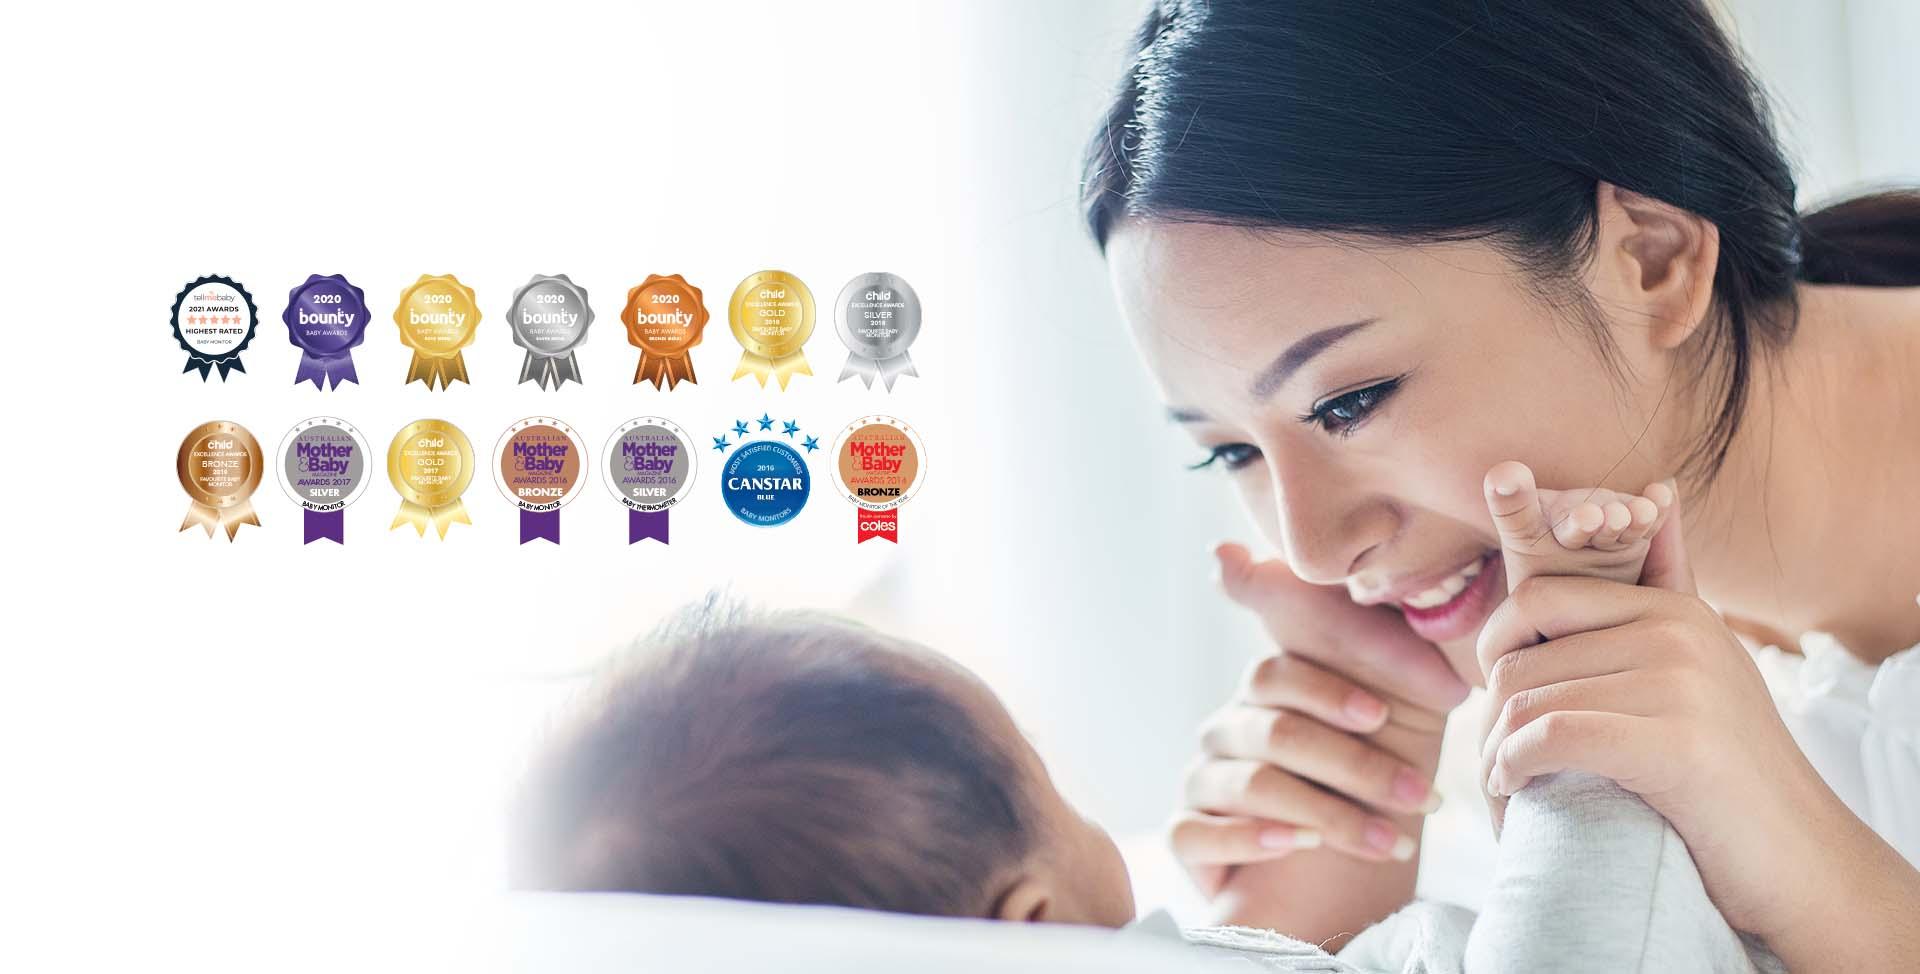 Award-Winning-Baby-Products